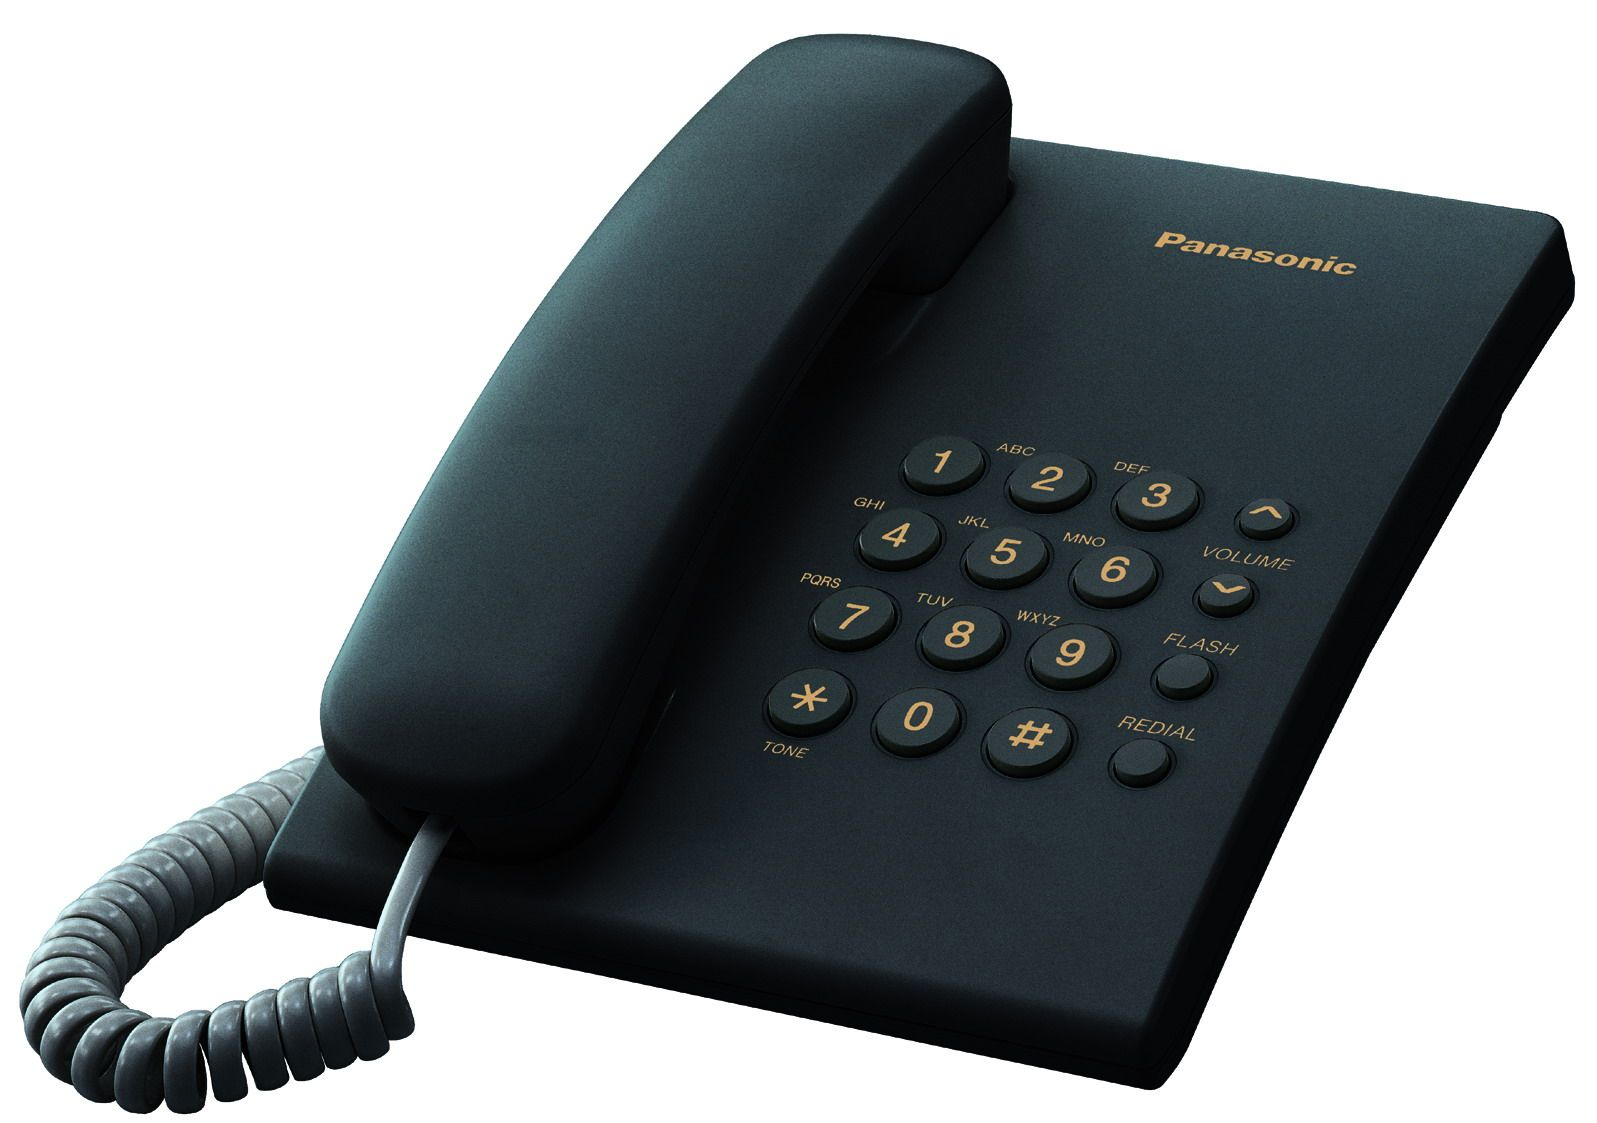 Телефон проводной Panasonic KX-TS2350RUB от Ravta